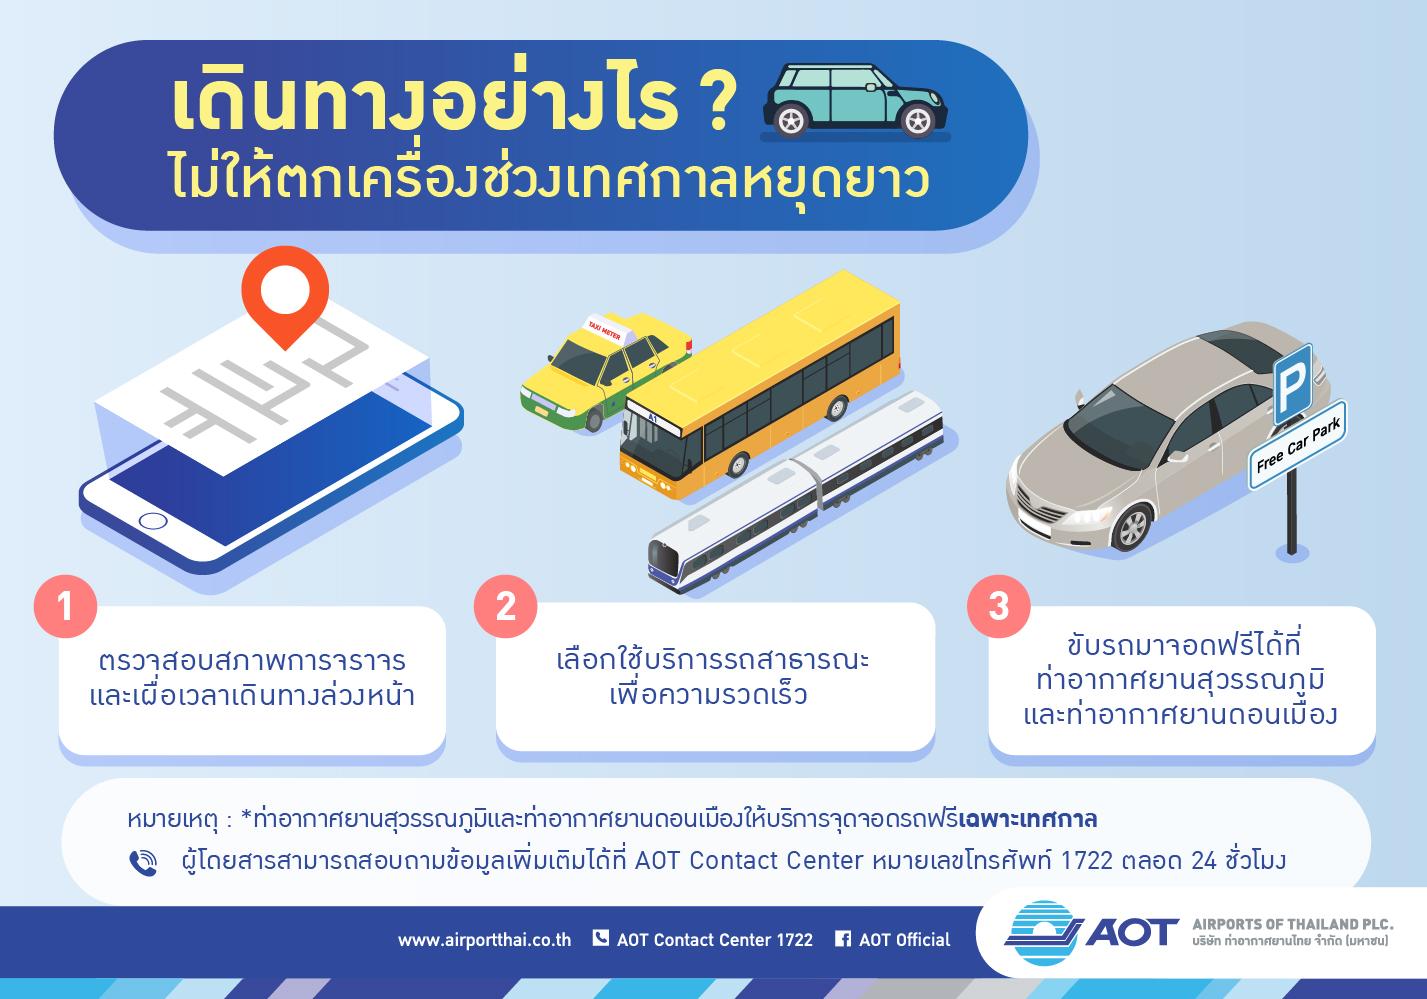 AOTcontent2019_Infographic_07_การเตรียมตัวก่อนเดินทางในช่วงเทศกาลหยุดยาว_Page02